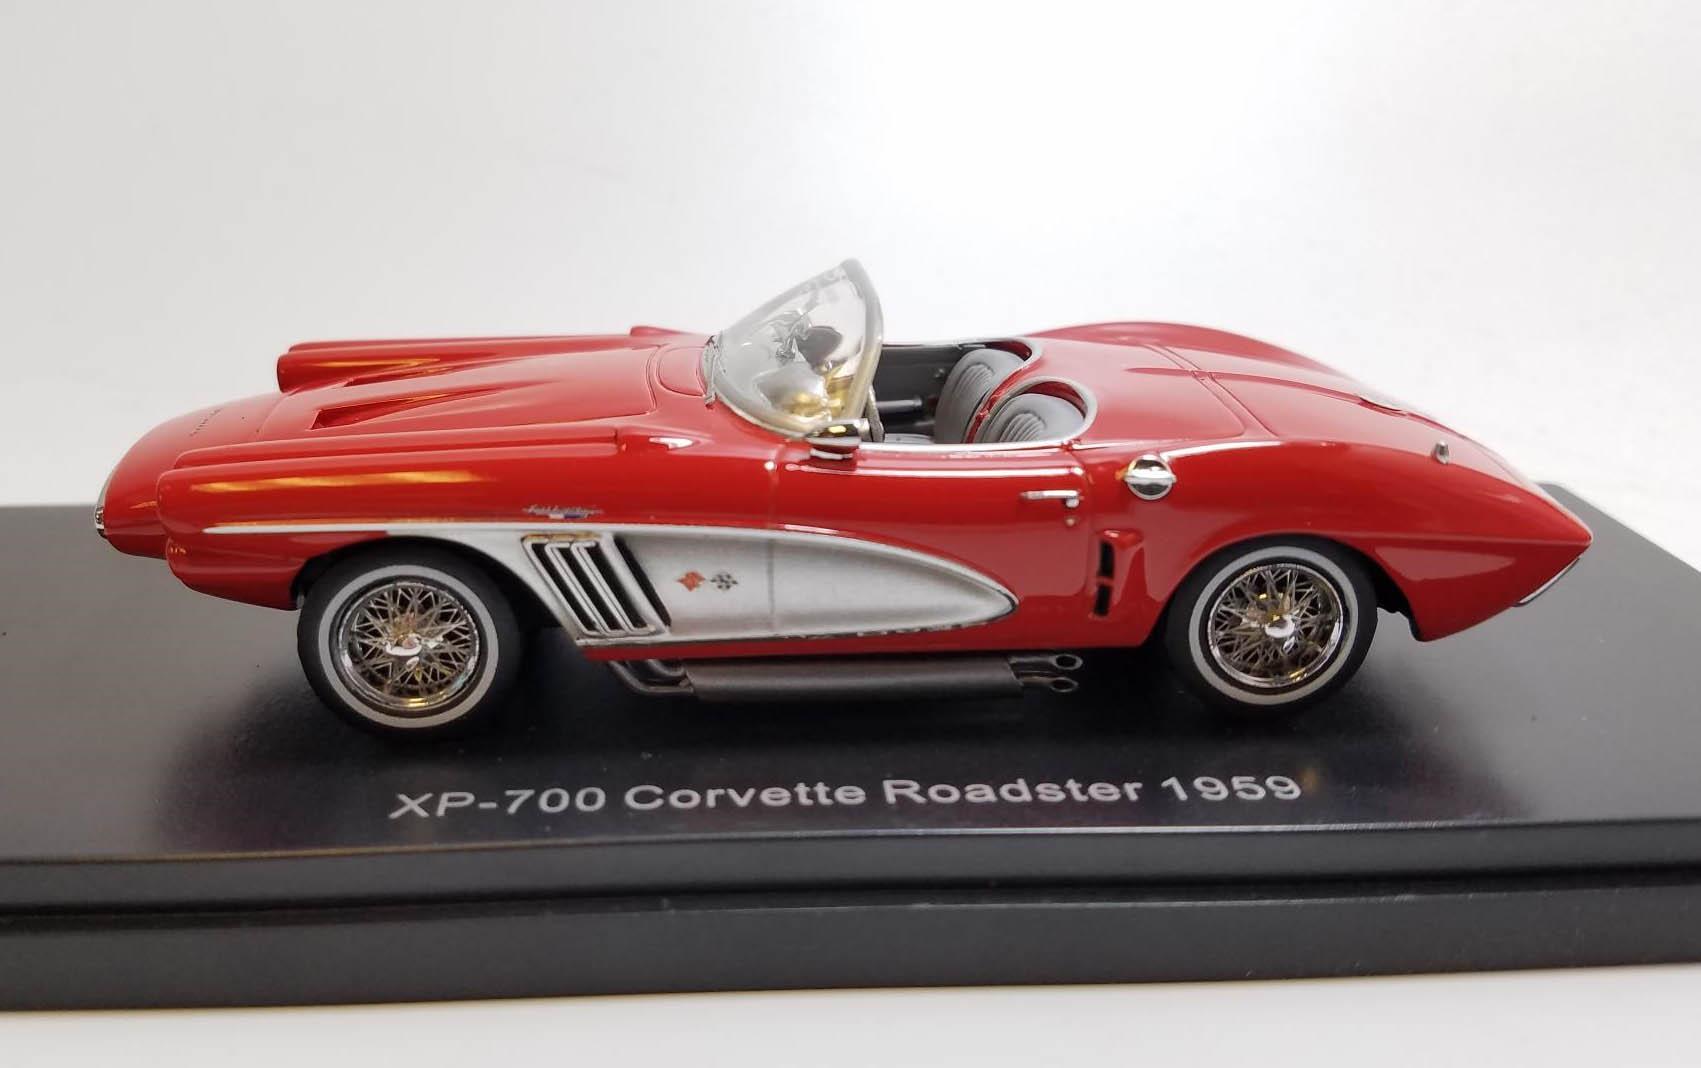 1959-1:43 #46516 rot Neo Chevrolet Corvette XP-700 Roadster Concept